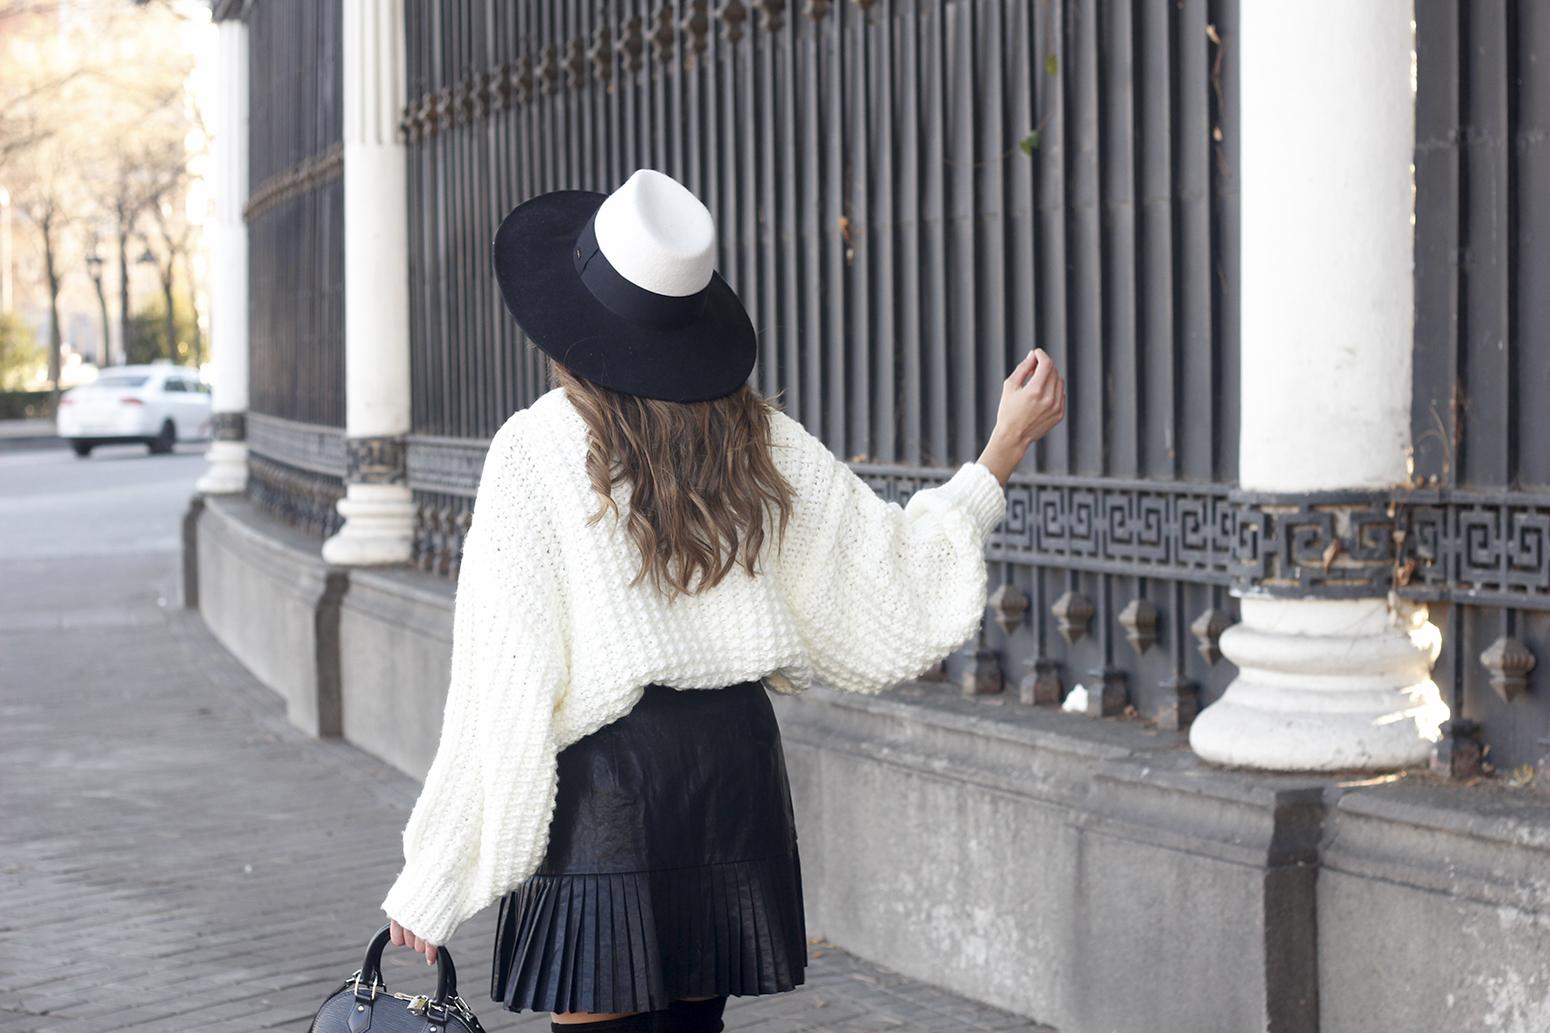 black pleated skirt  white sweater louis vuitton bag street style inspiration 201912